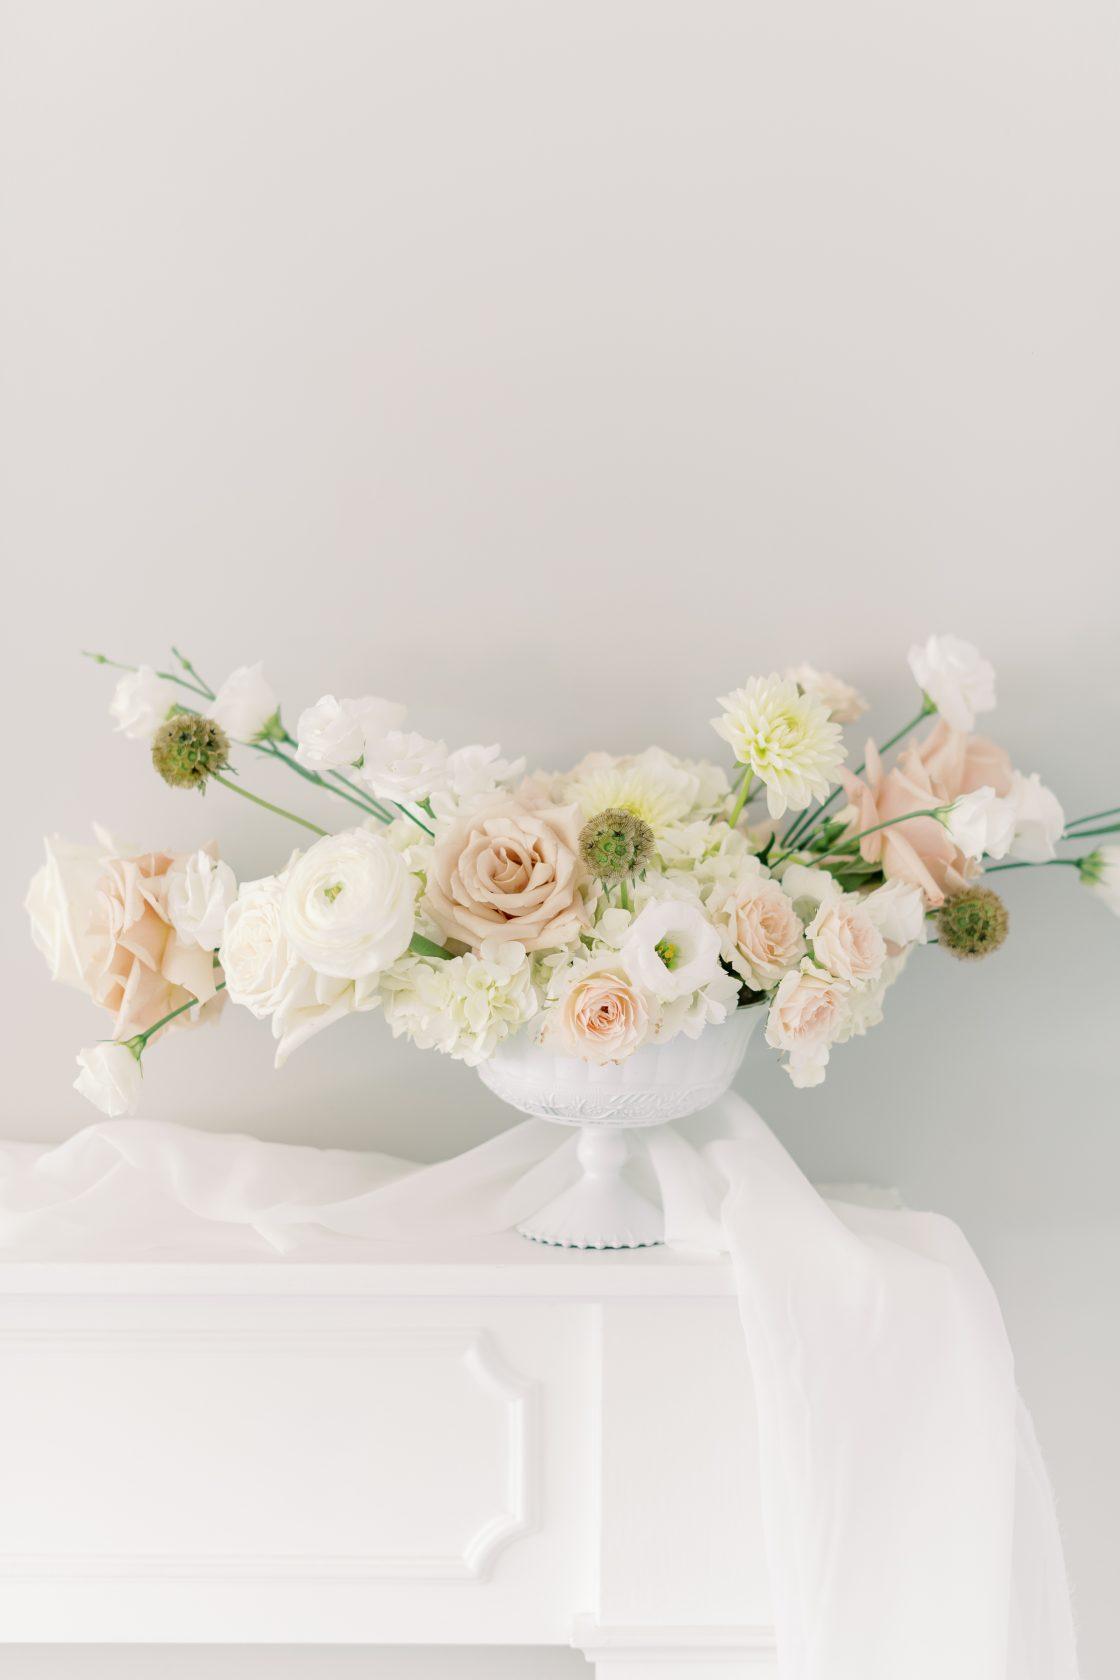 Light Ethereal Wedding Centerpiece